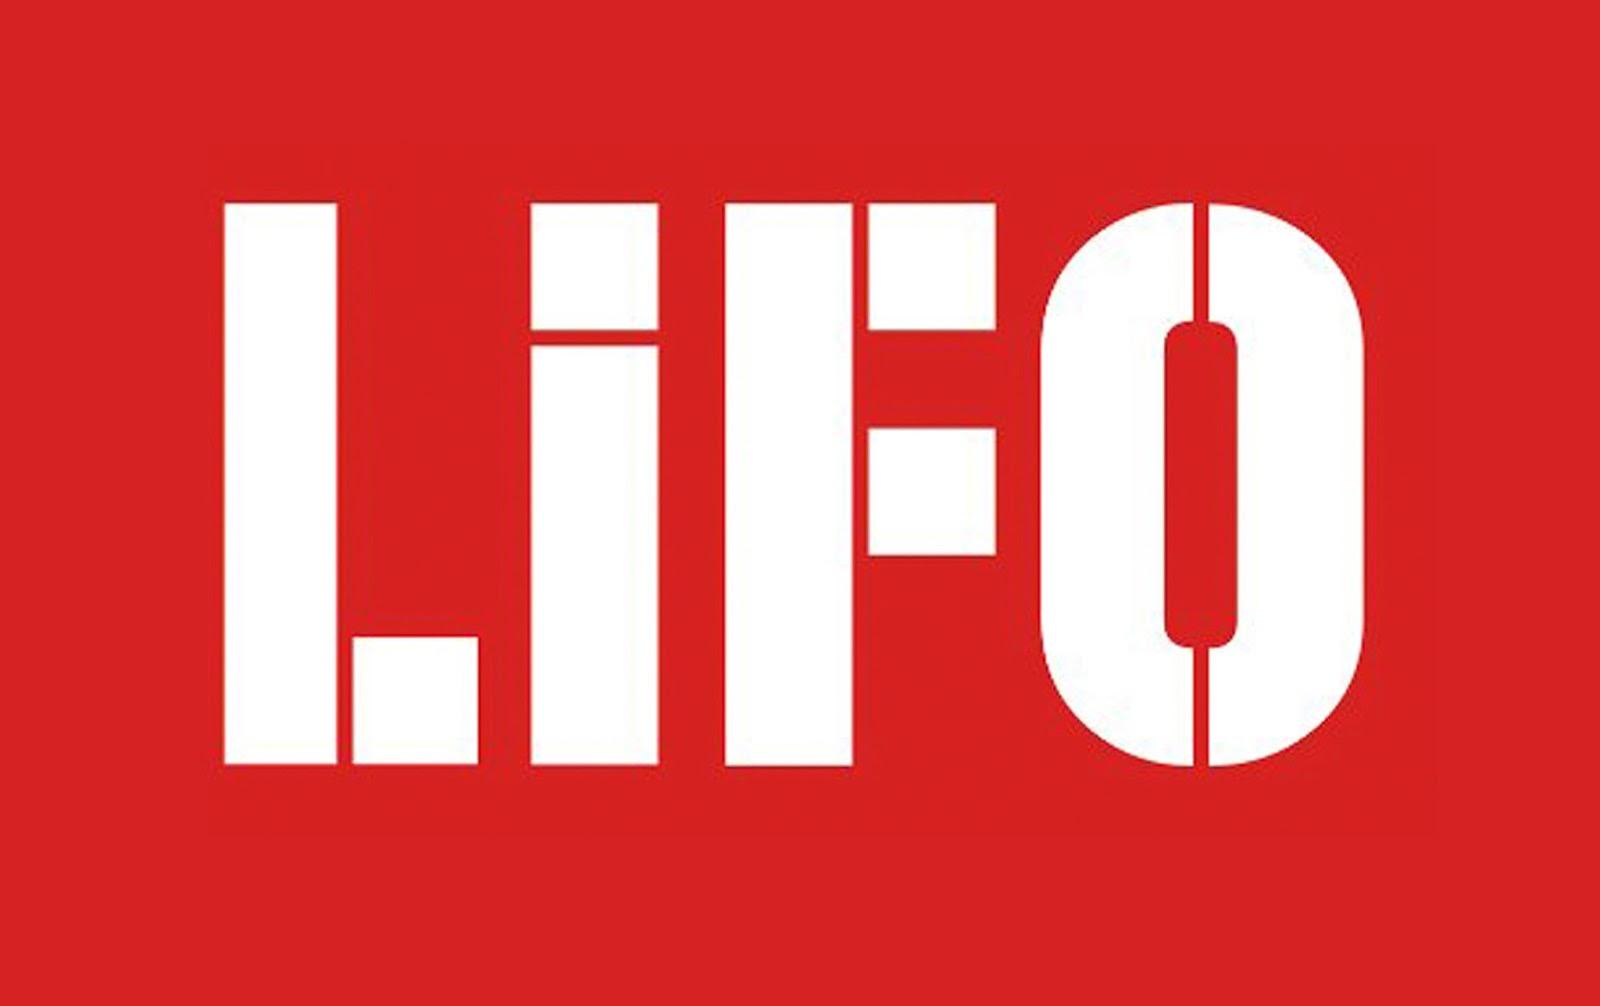 Pengertian LIFO (Last In First Out) Dalam Ilmu Marketing